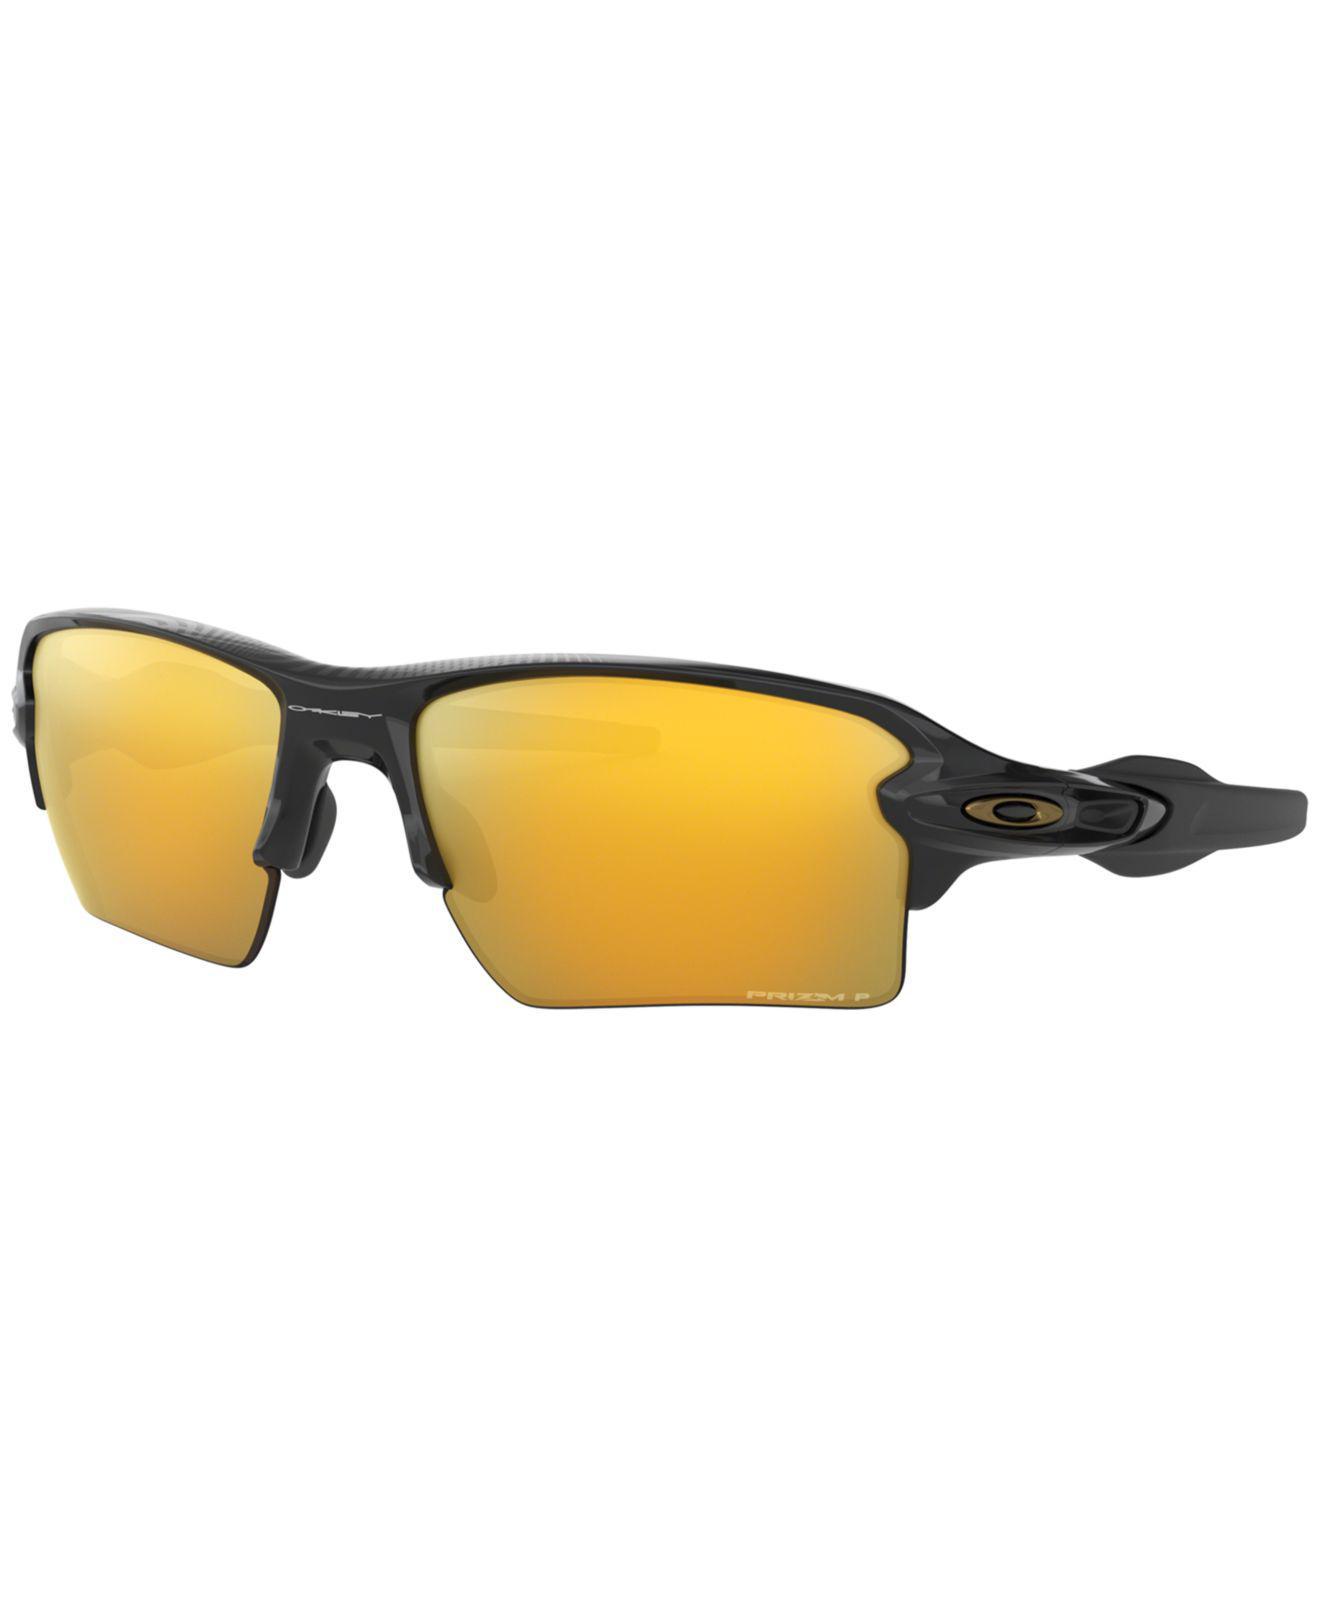 8145f0fe03 Lyst - Oakley Polarized Sunglasses